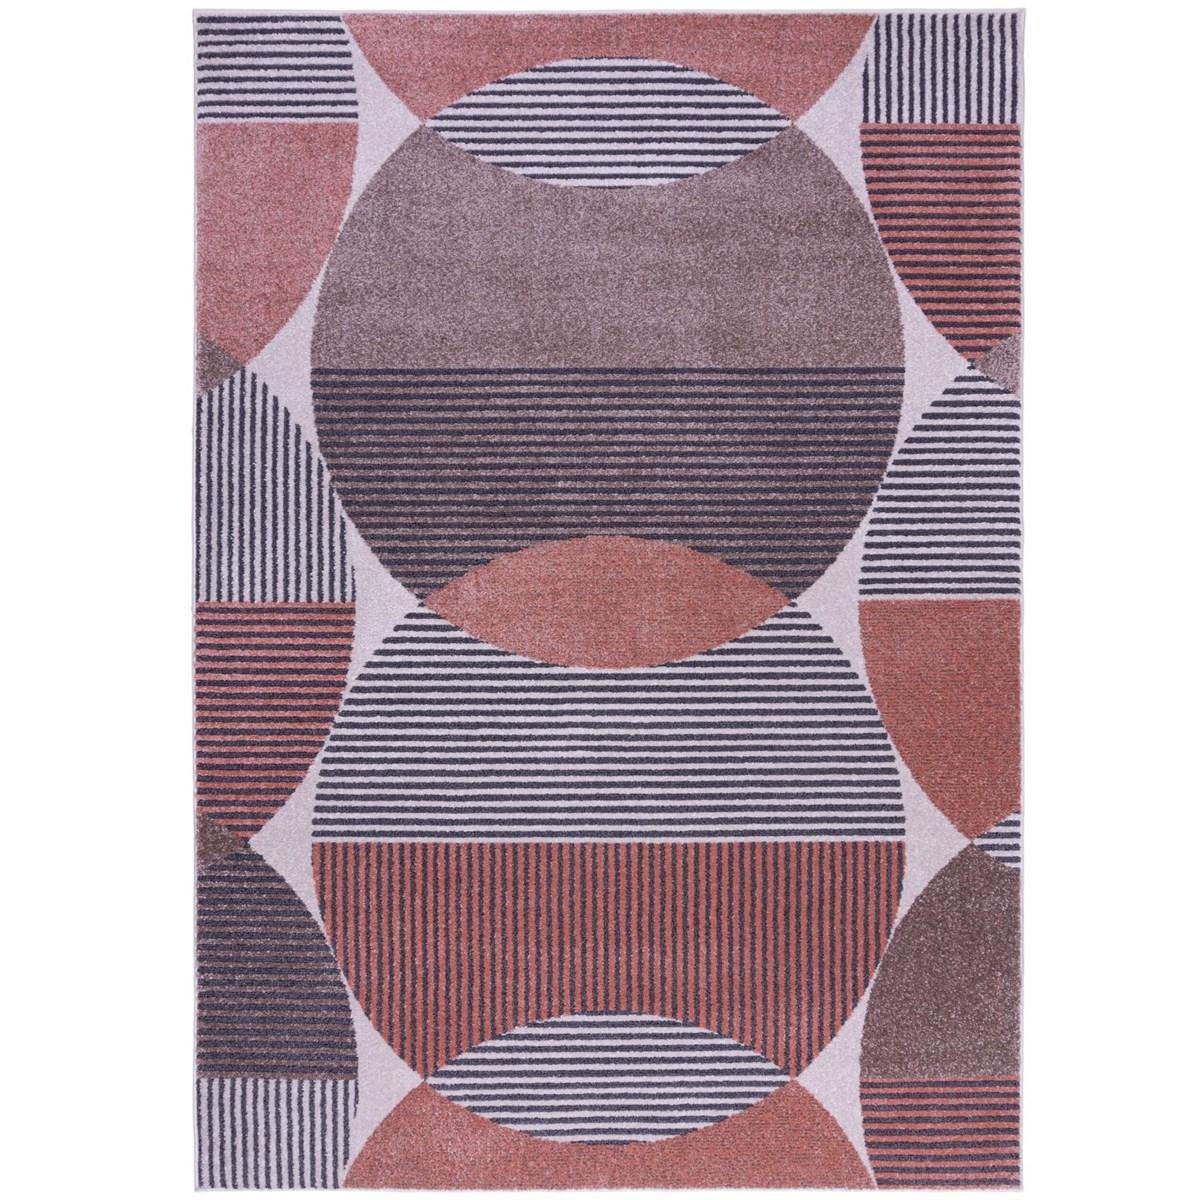 Tapis de salon en Polypropylène Rose foncé 120x170 cm